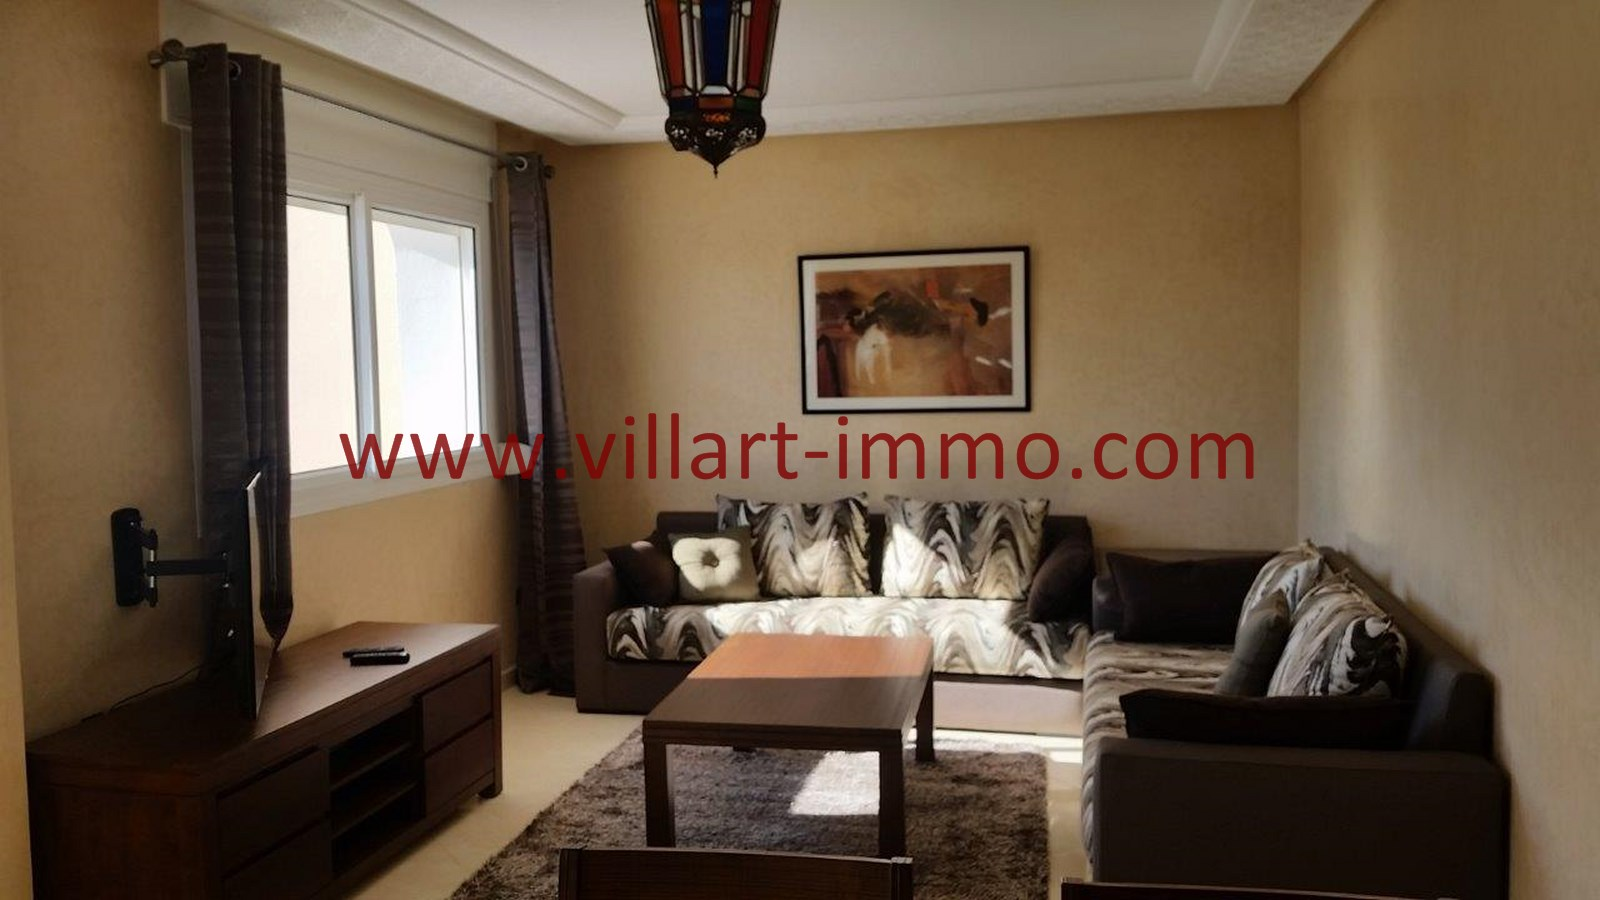 Location appartement meubl tanger avec terrasse zone for Location appartement l